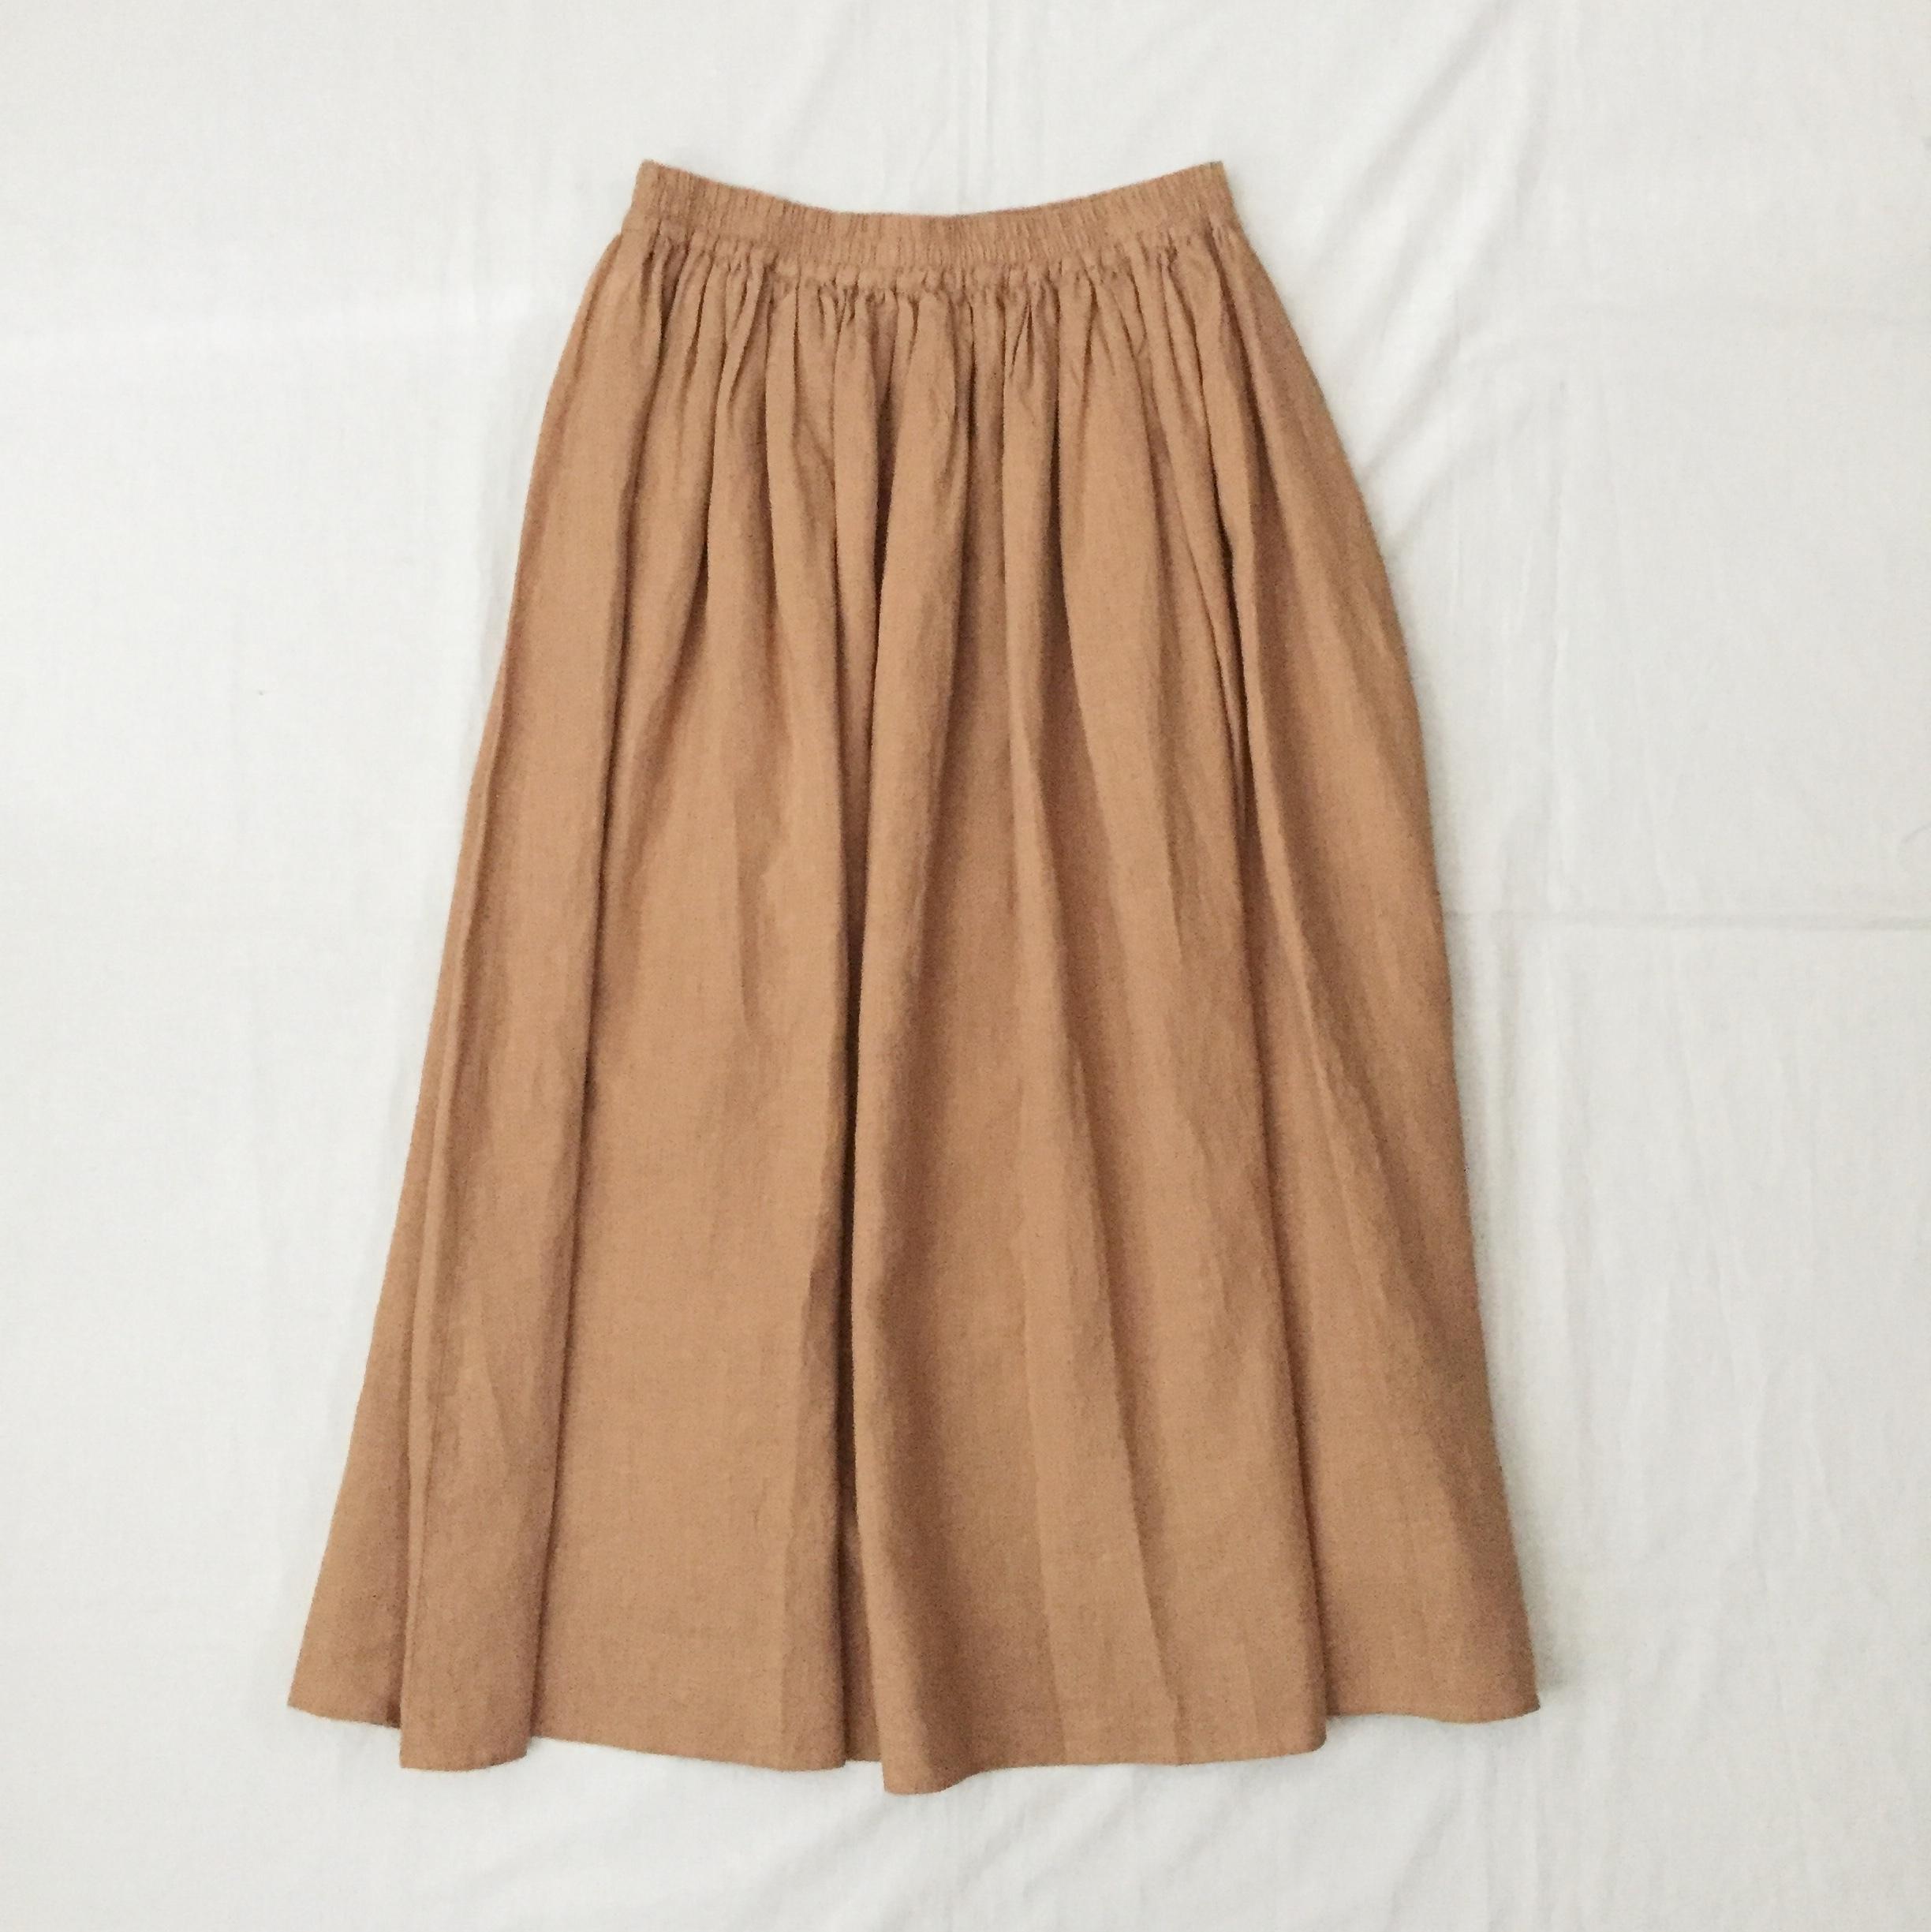 TINA and SUSIE 40sフレンチリネンキャンバススカート